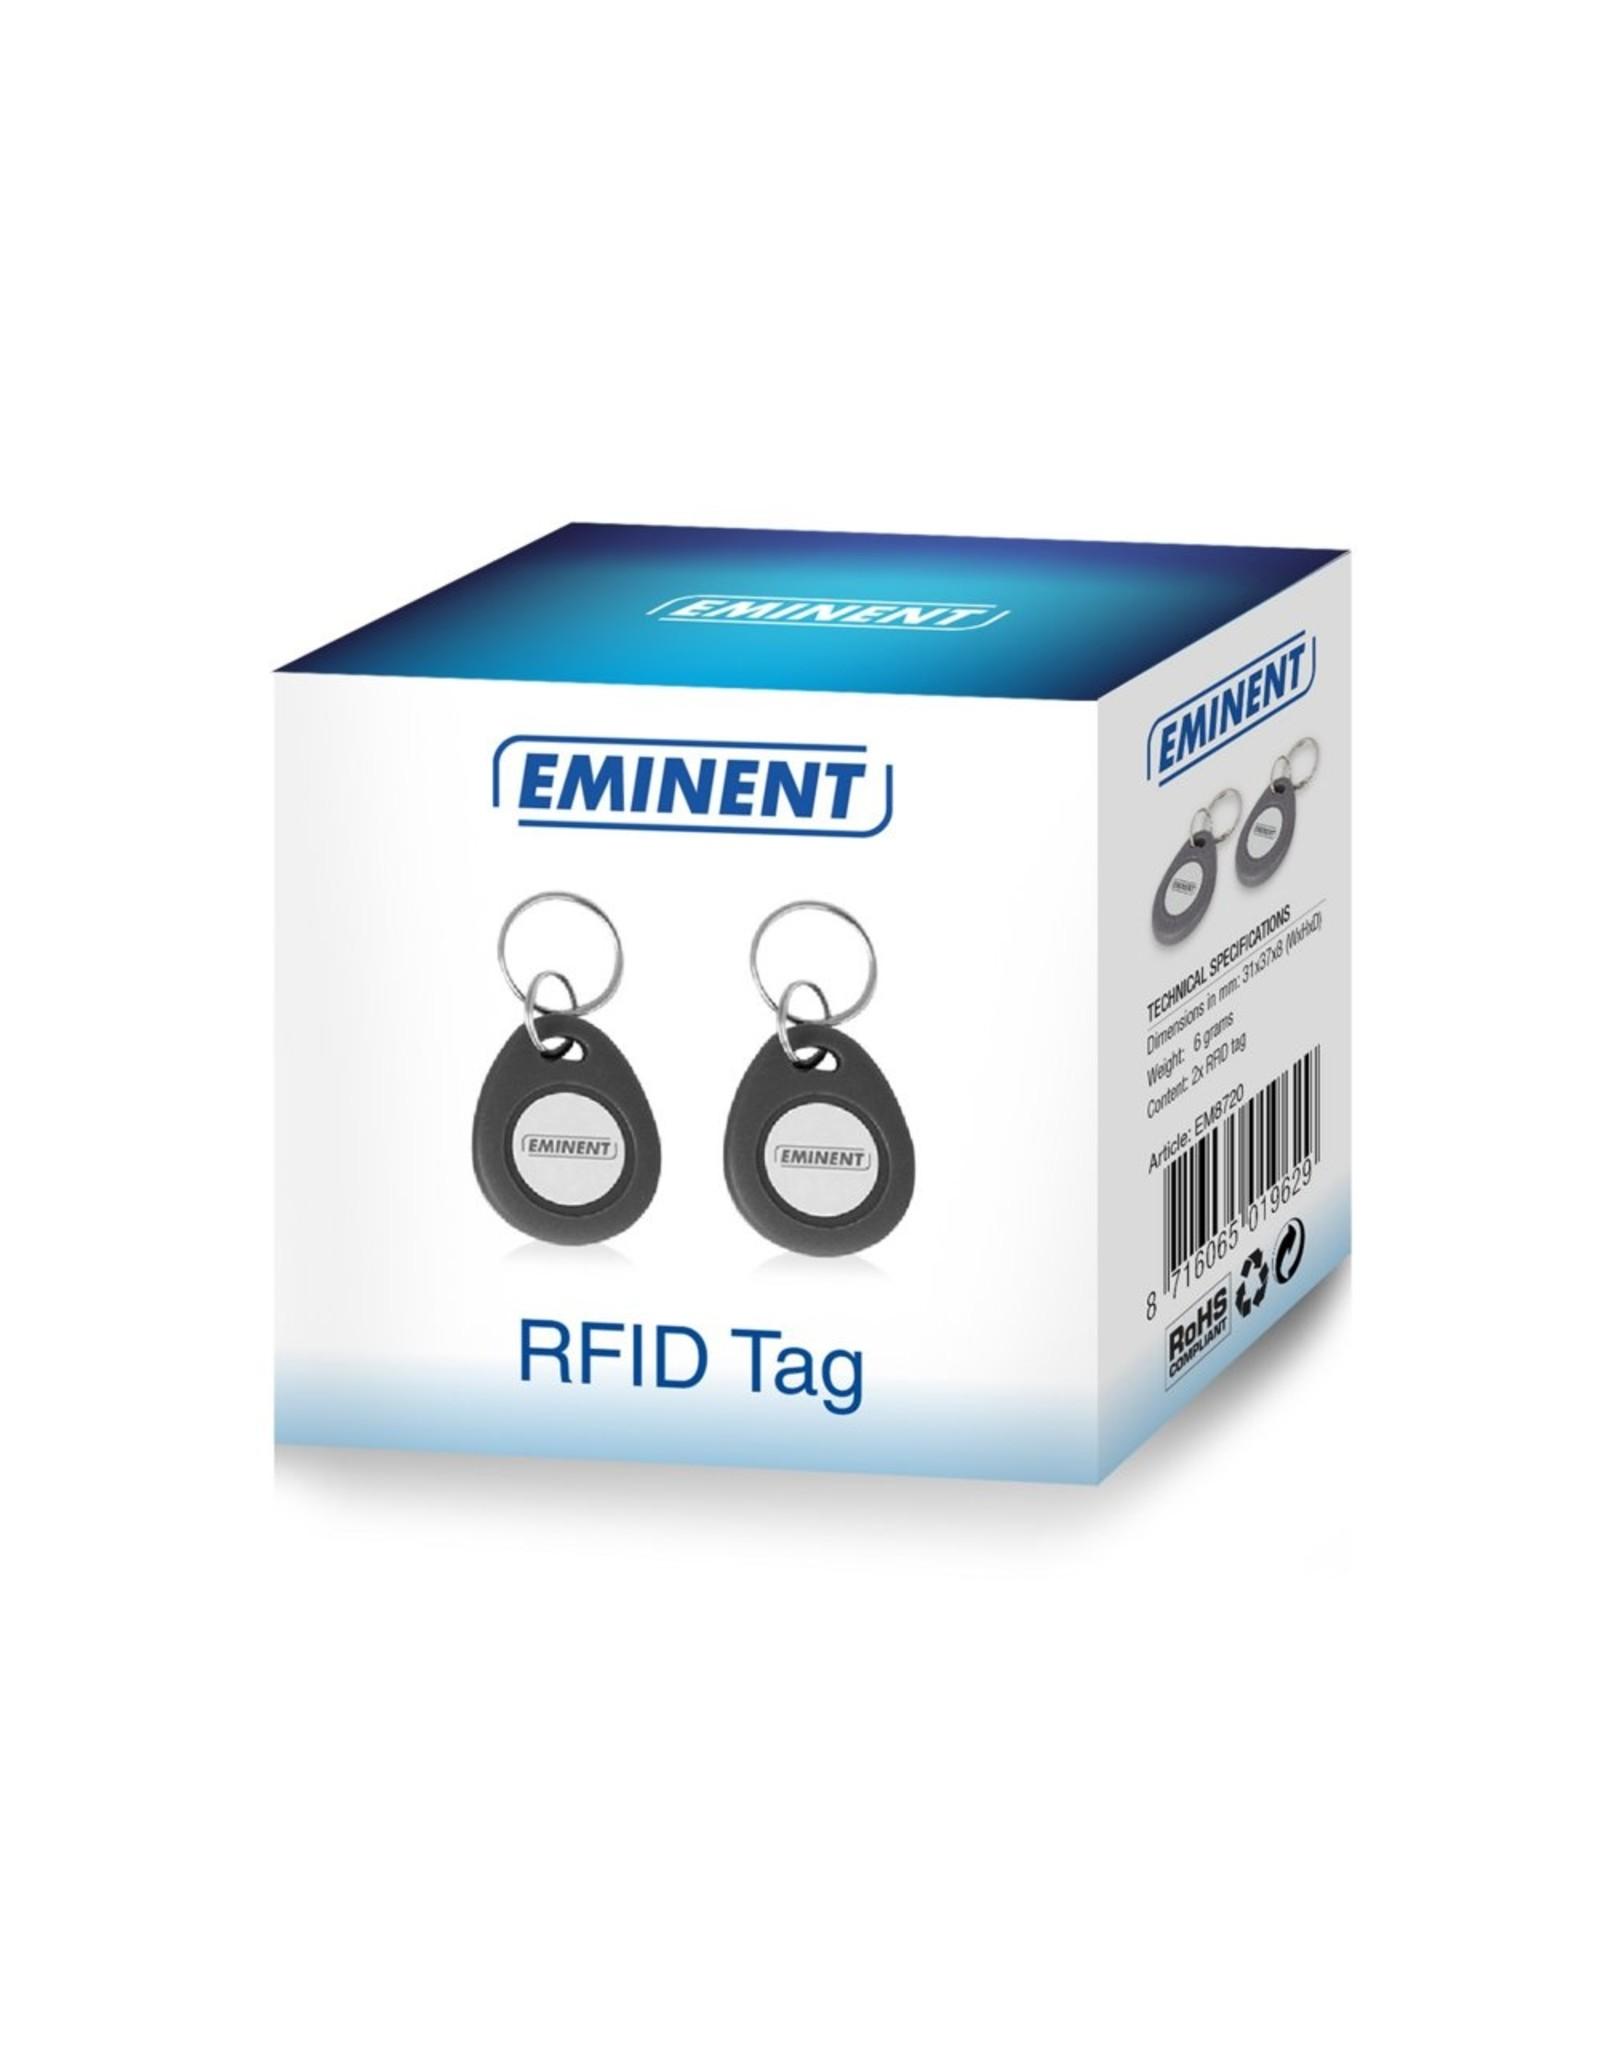 Eminent RFID Tag for EM8710 wireless alarm system, 2 pieces